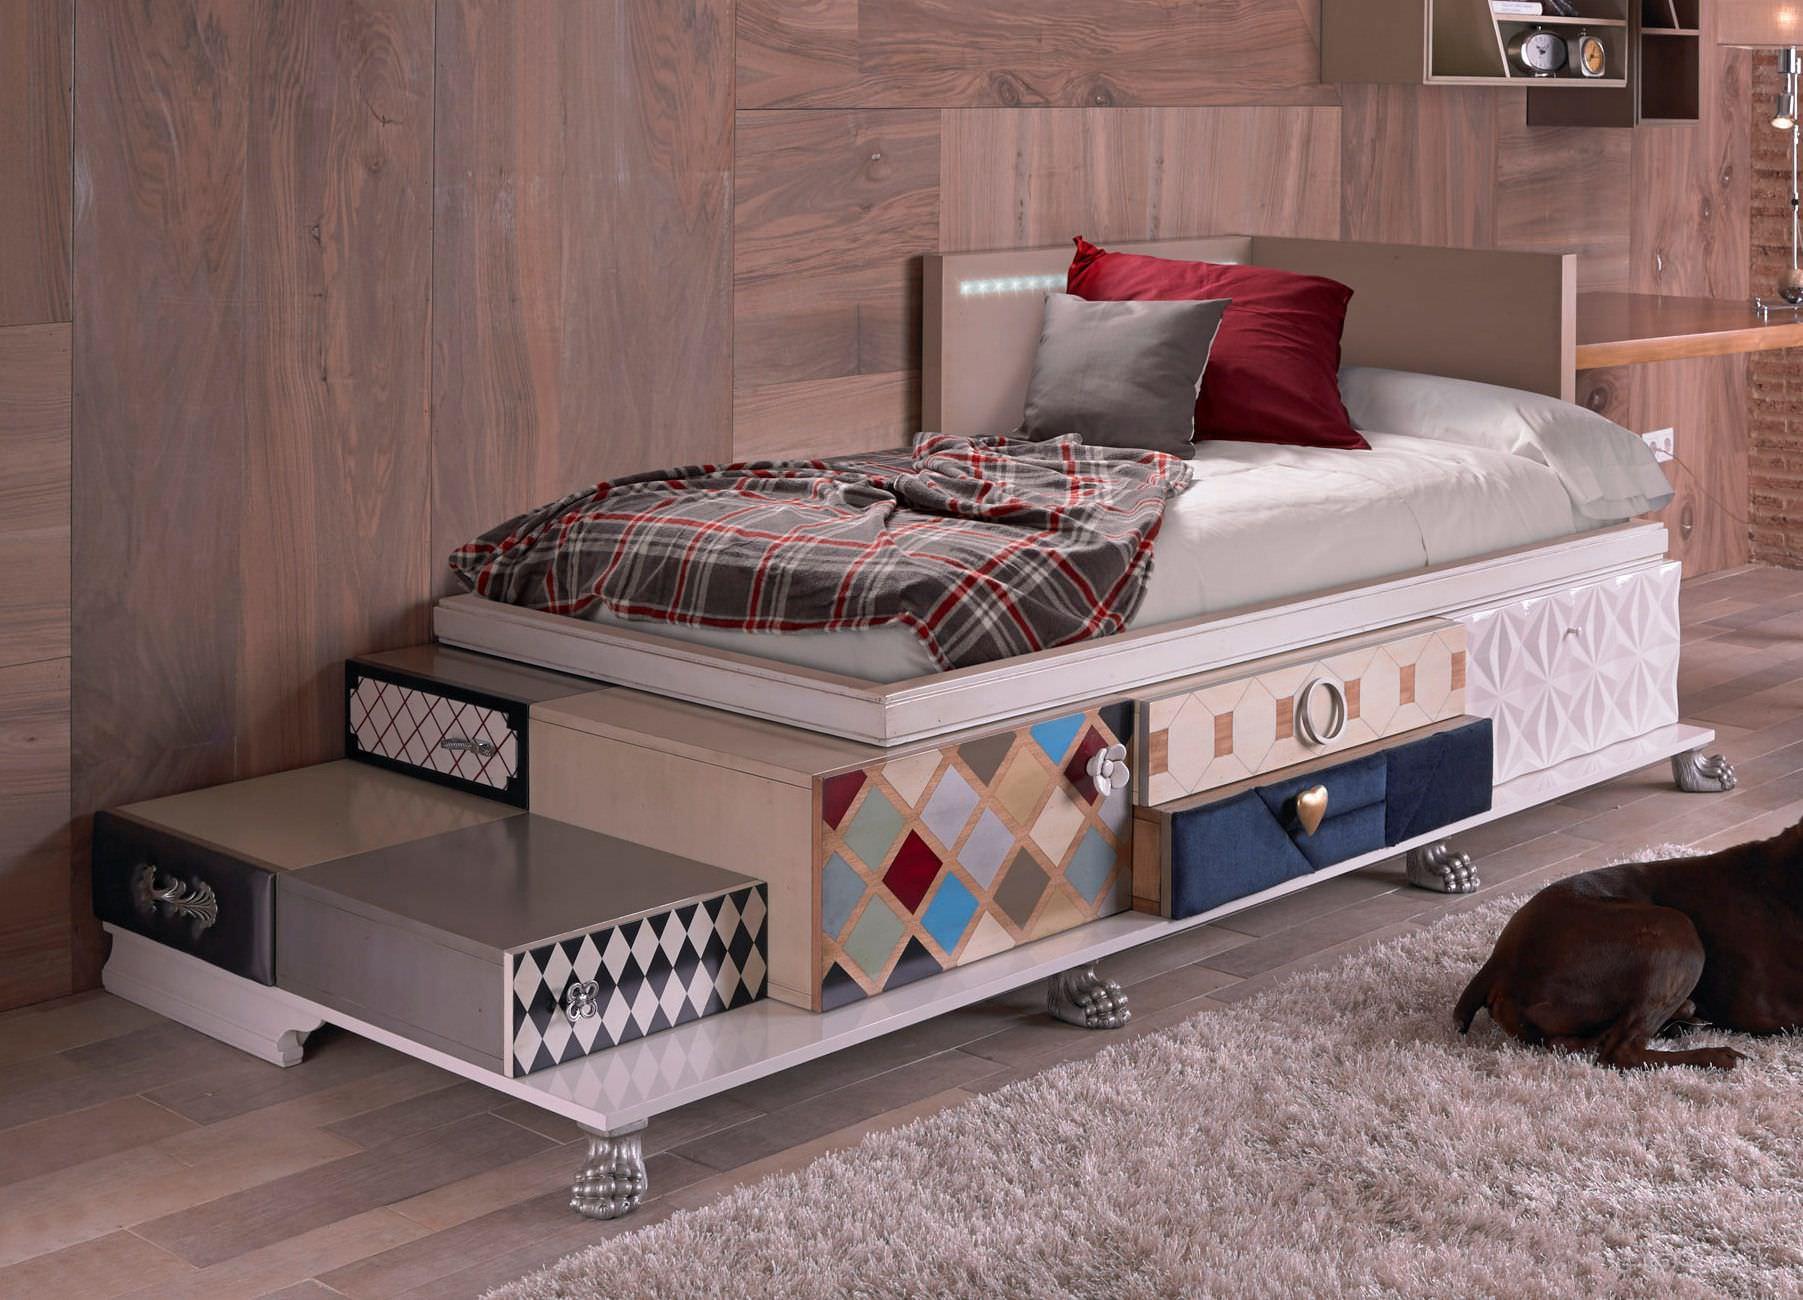 Modernes Bett / Für Kinder (Jungen Und Mächen) / Kombiniert / Holz   TETRIS  0080.T